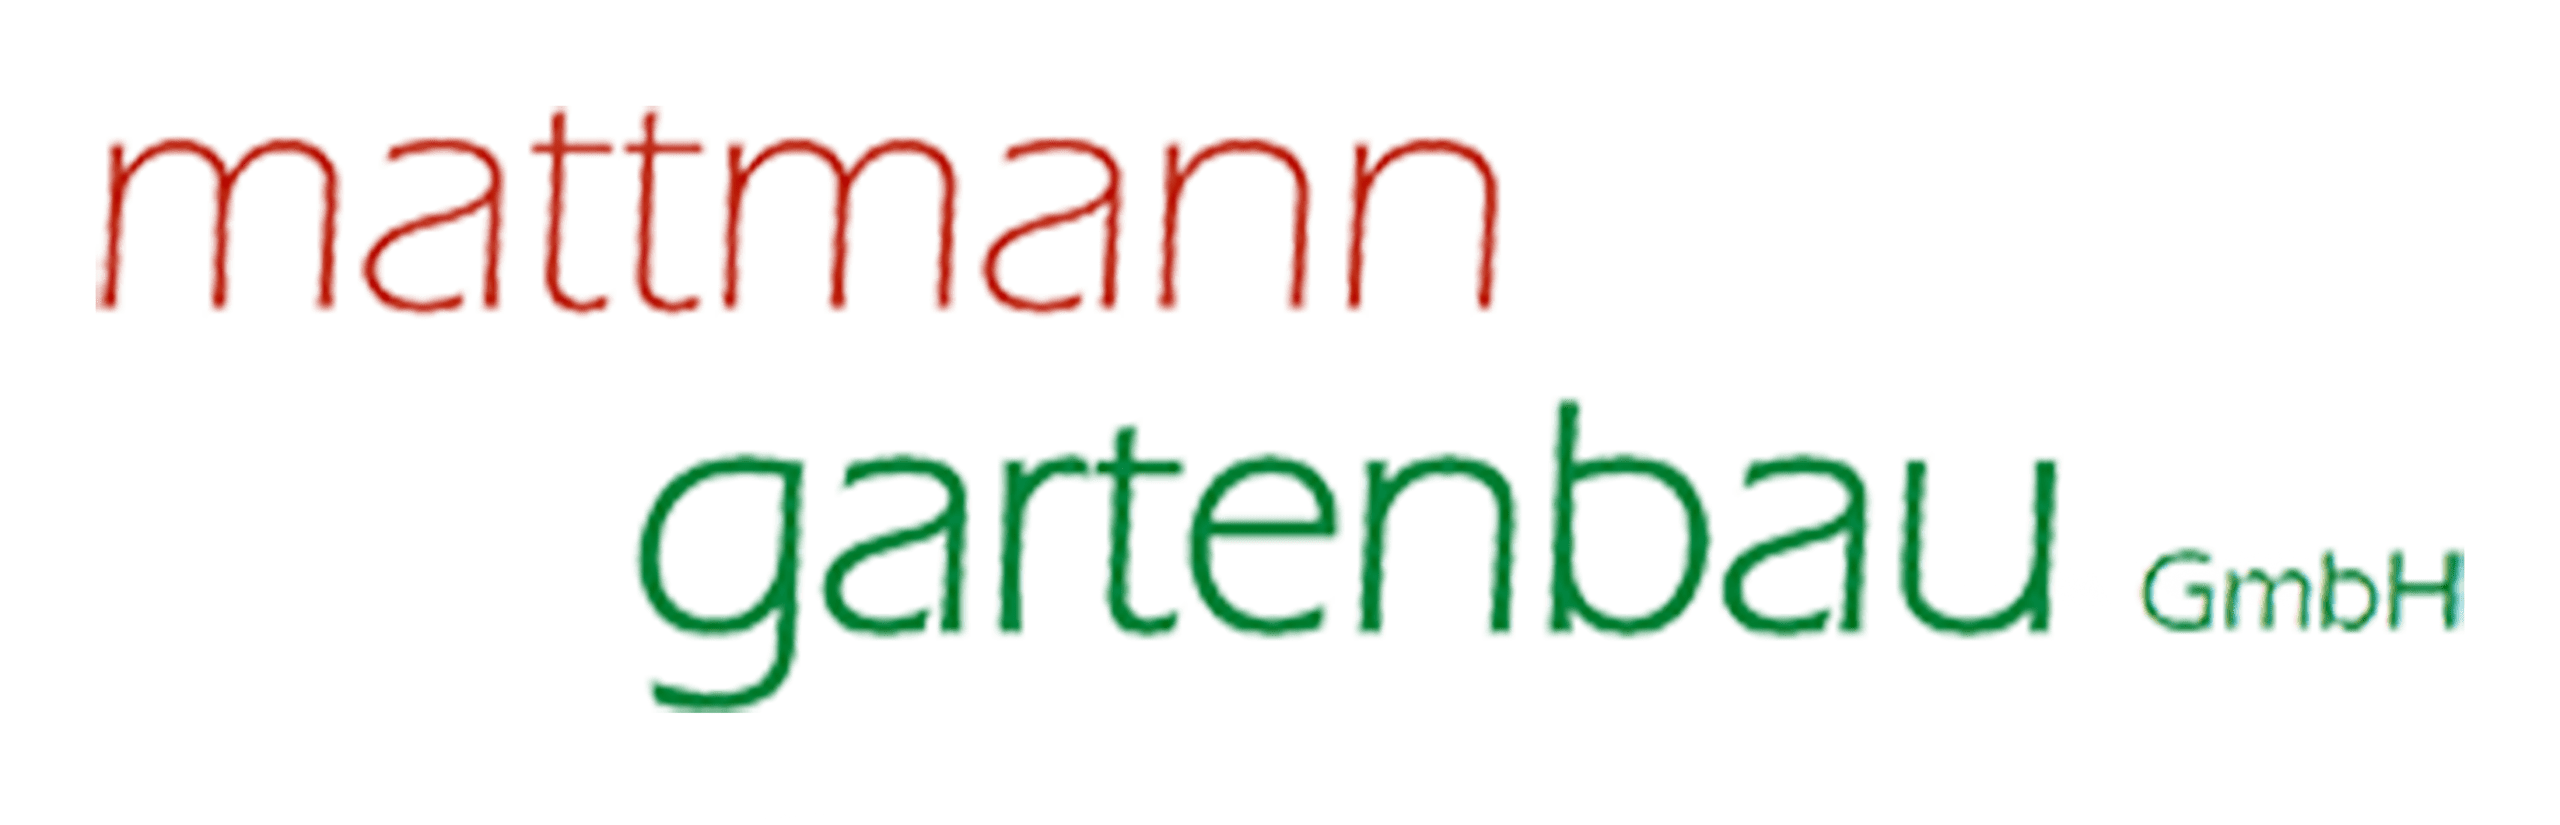 Mattmann Gartenbau GmbH